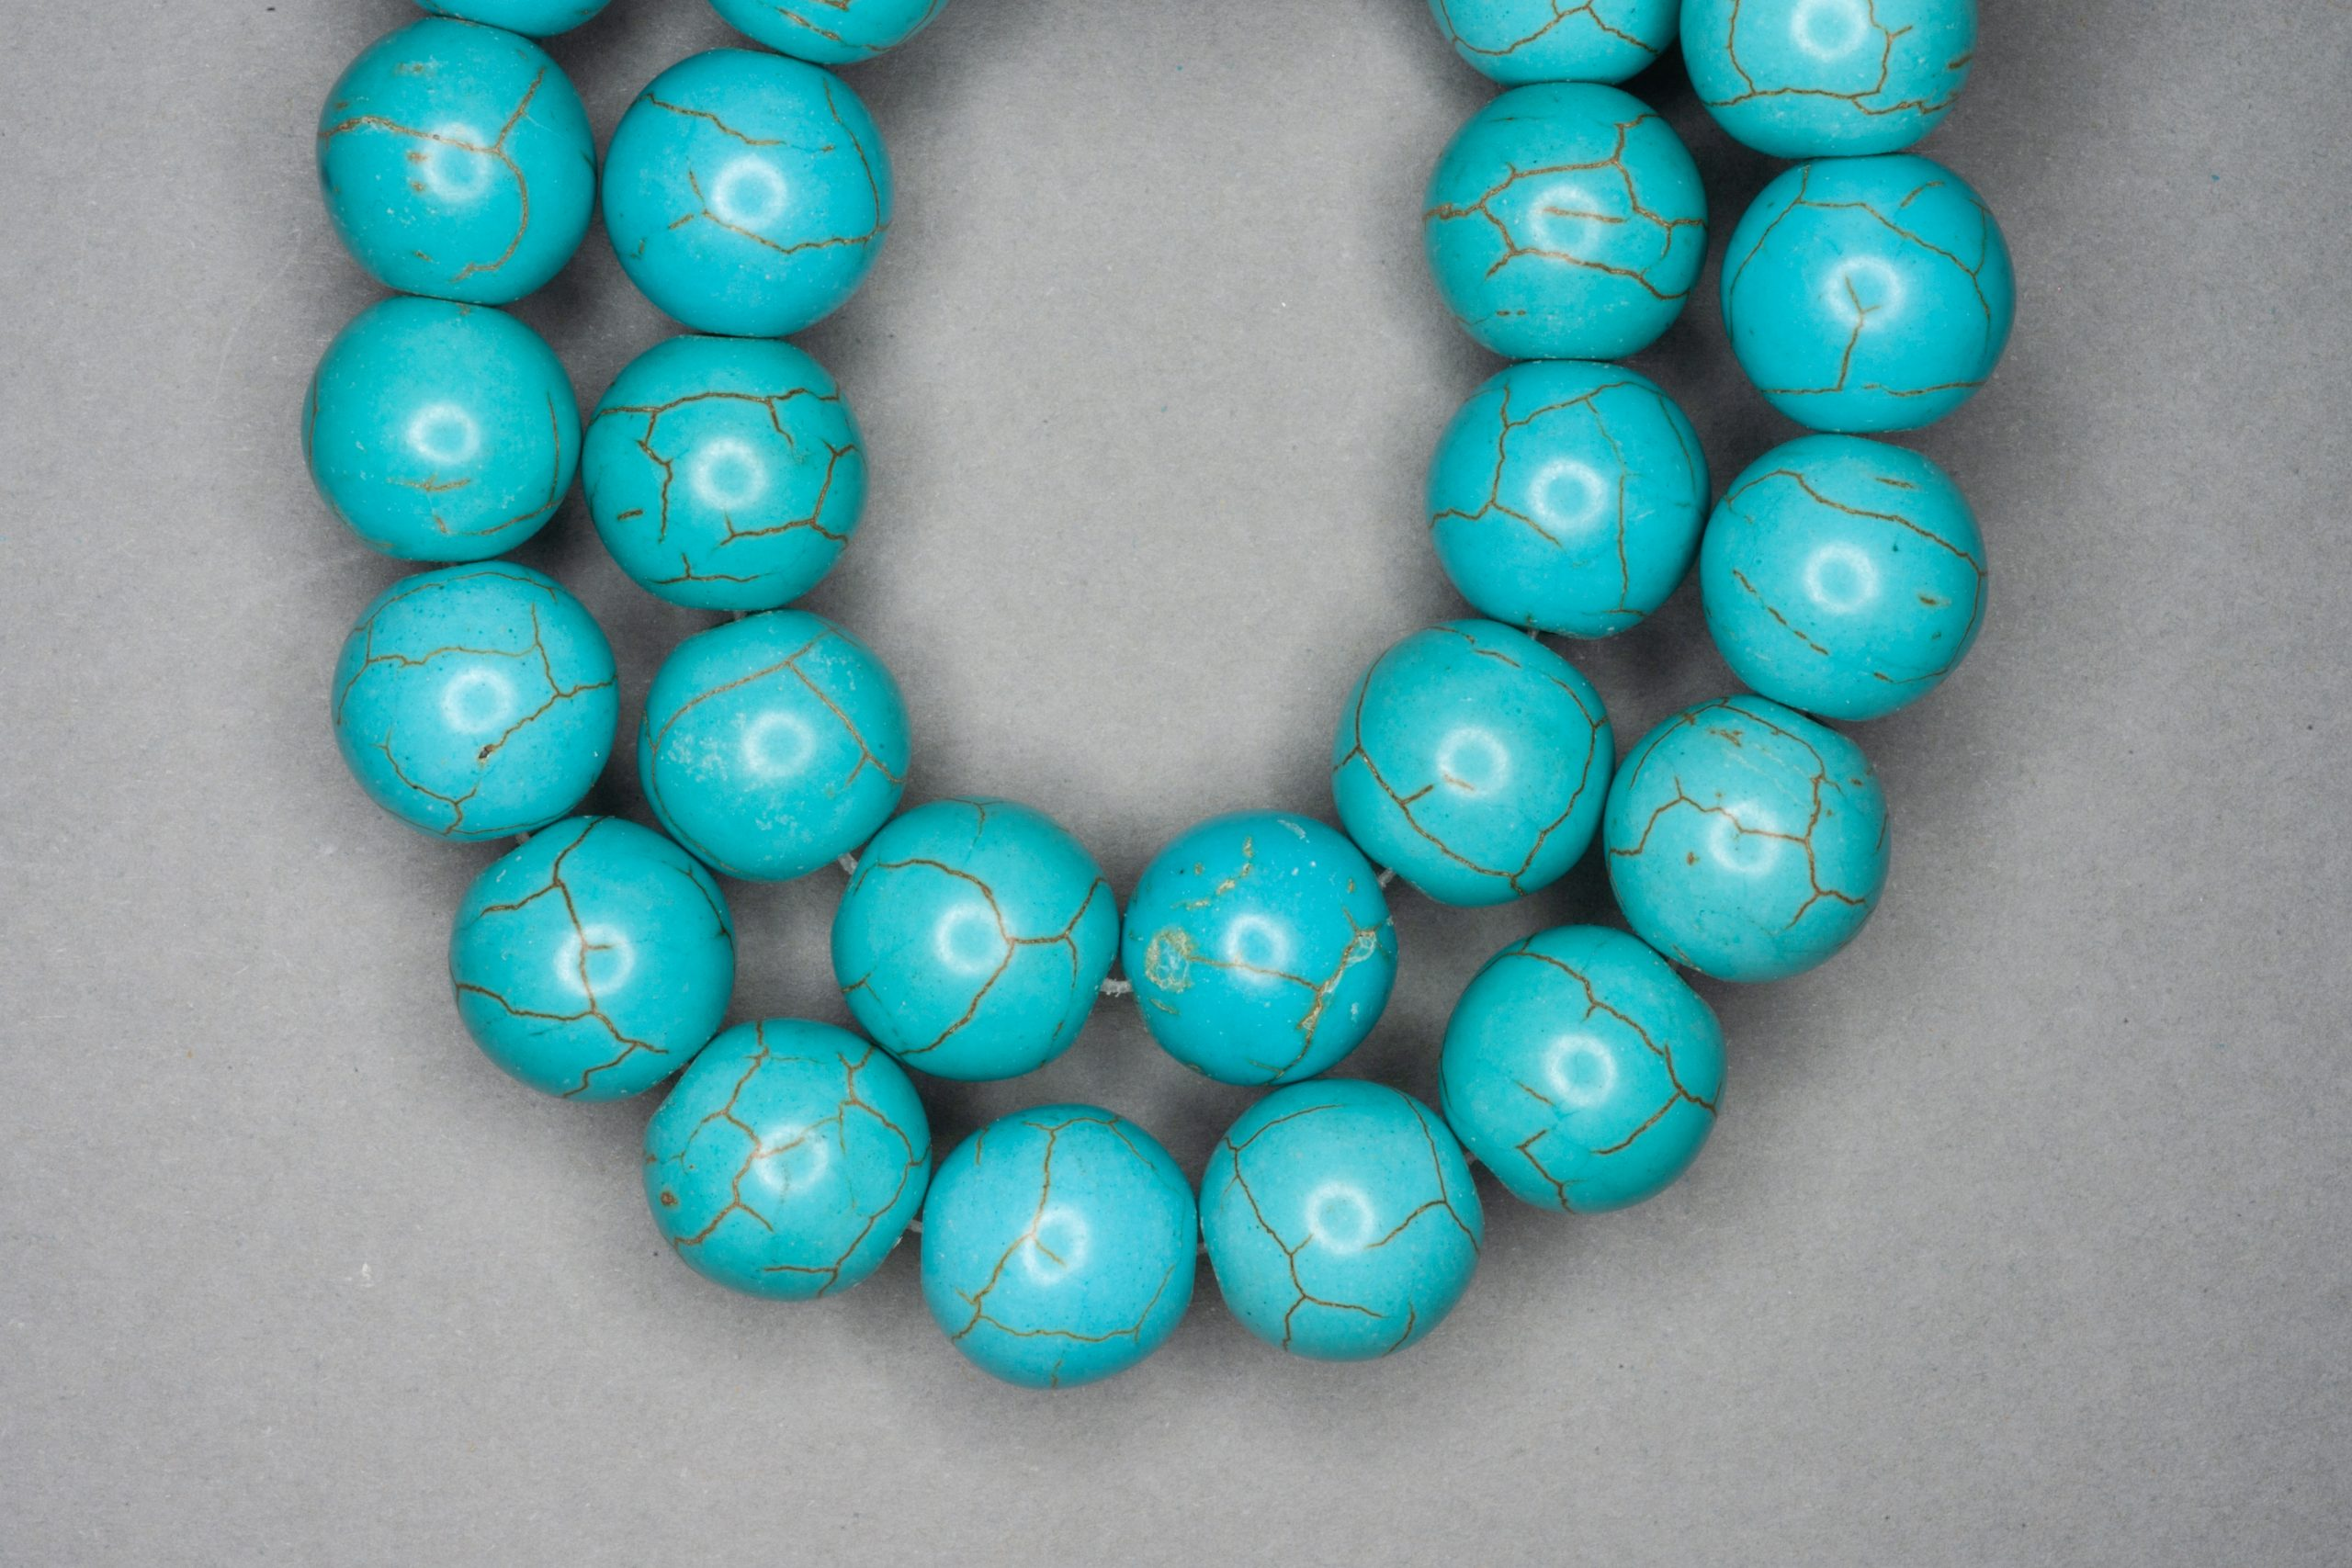 Chalk Turquoise 38cm Strand, 13mm Round